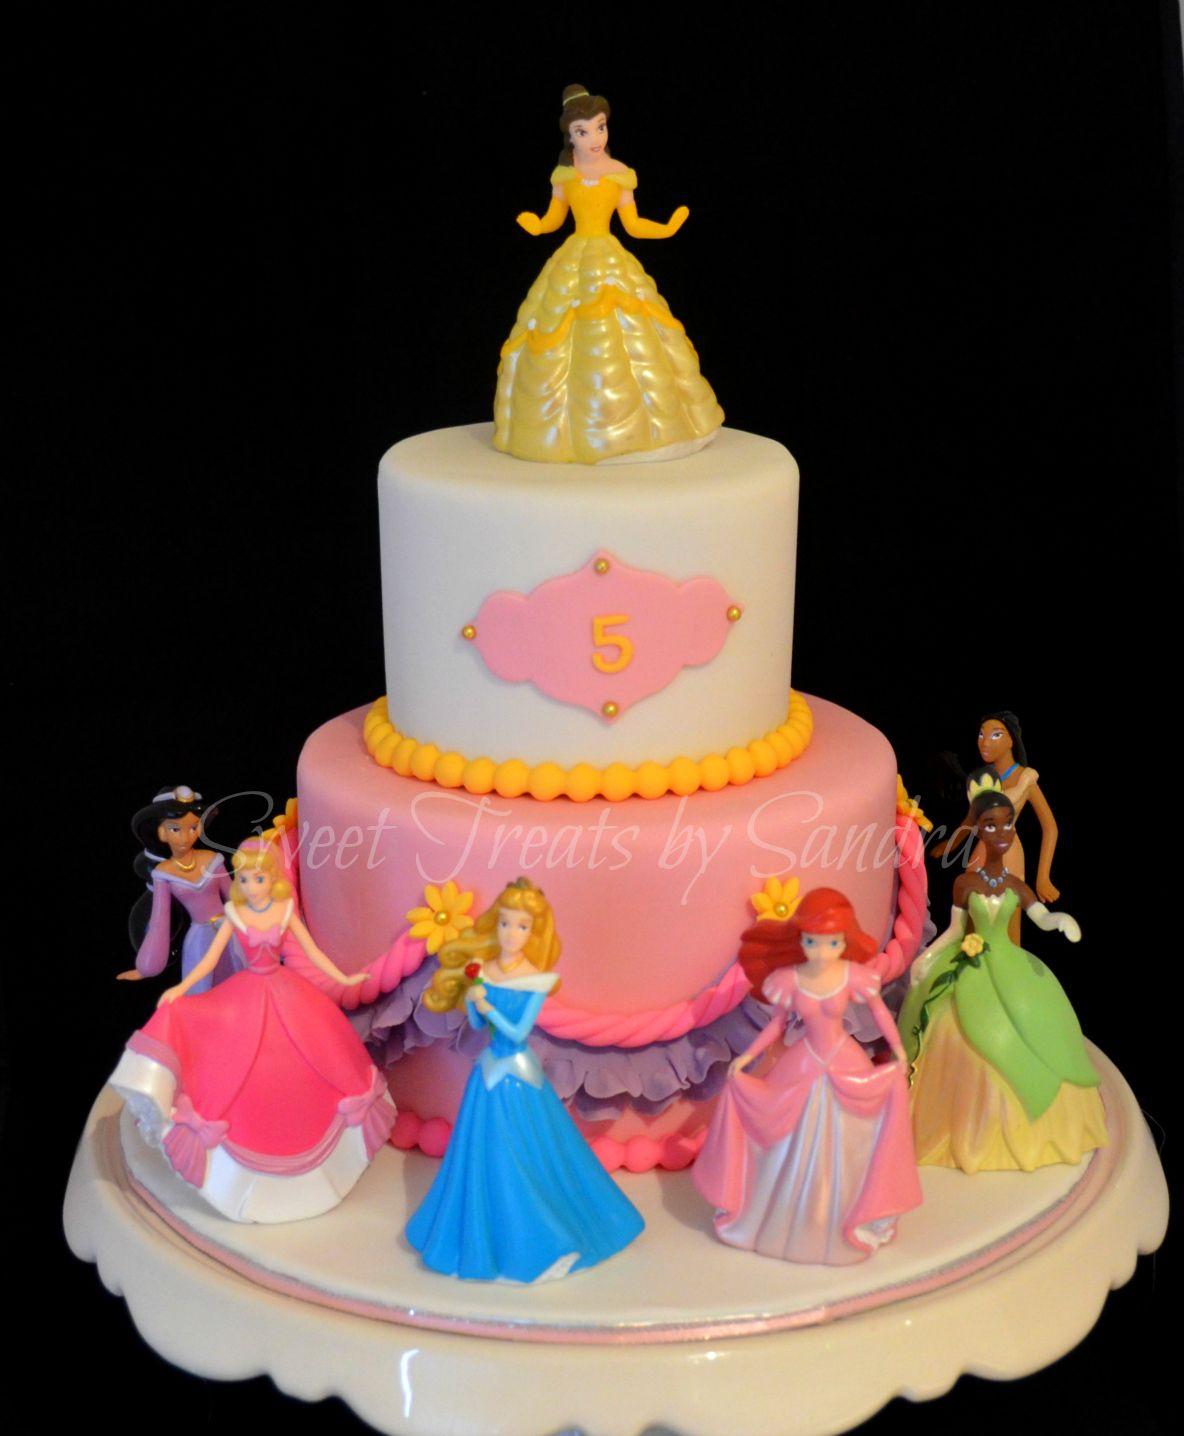 Disney Princess Cake For All Your Cake Decorating Supplies